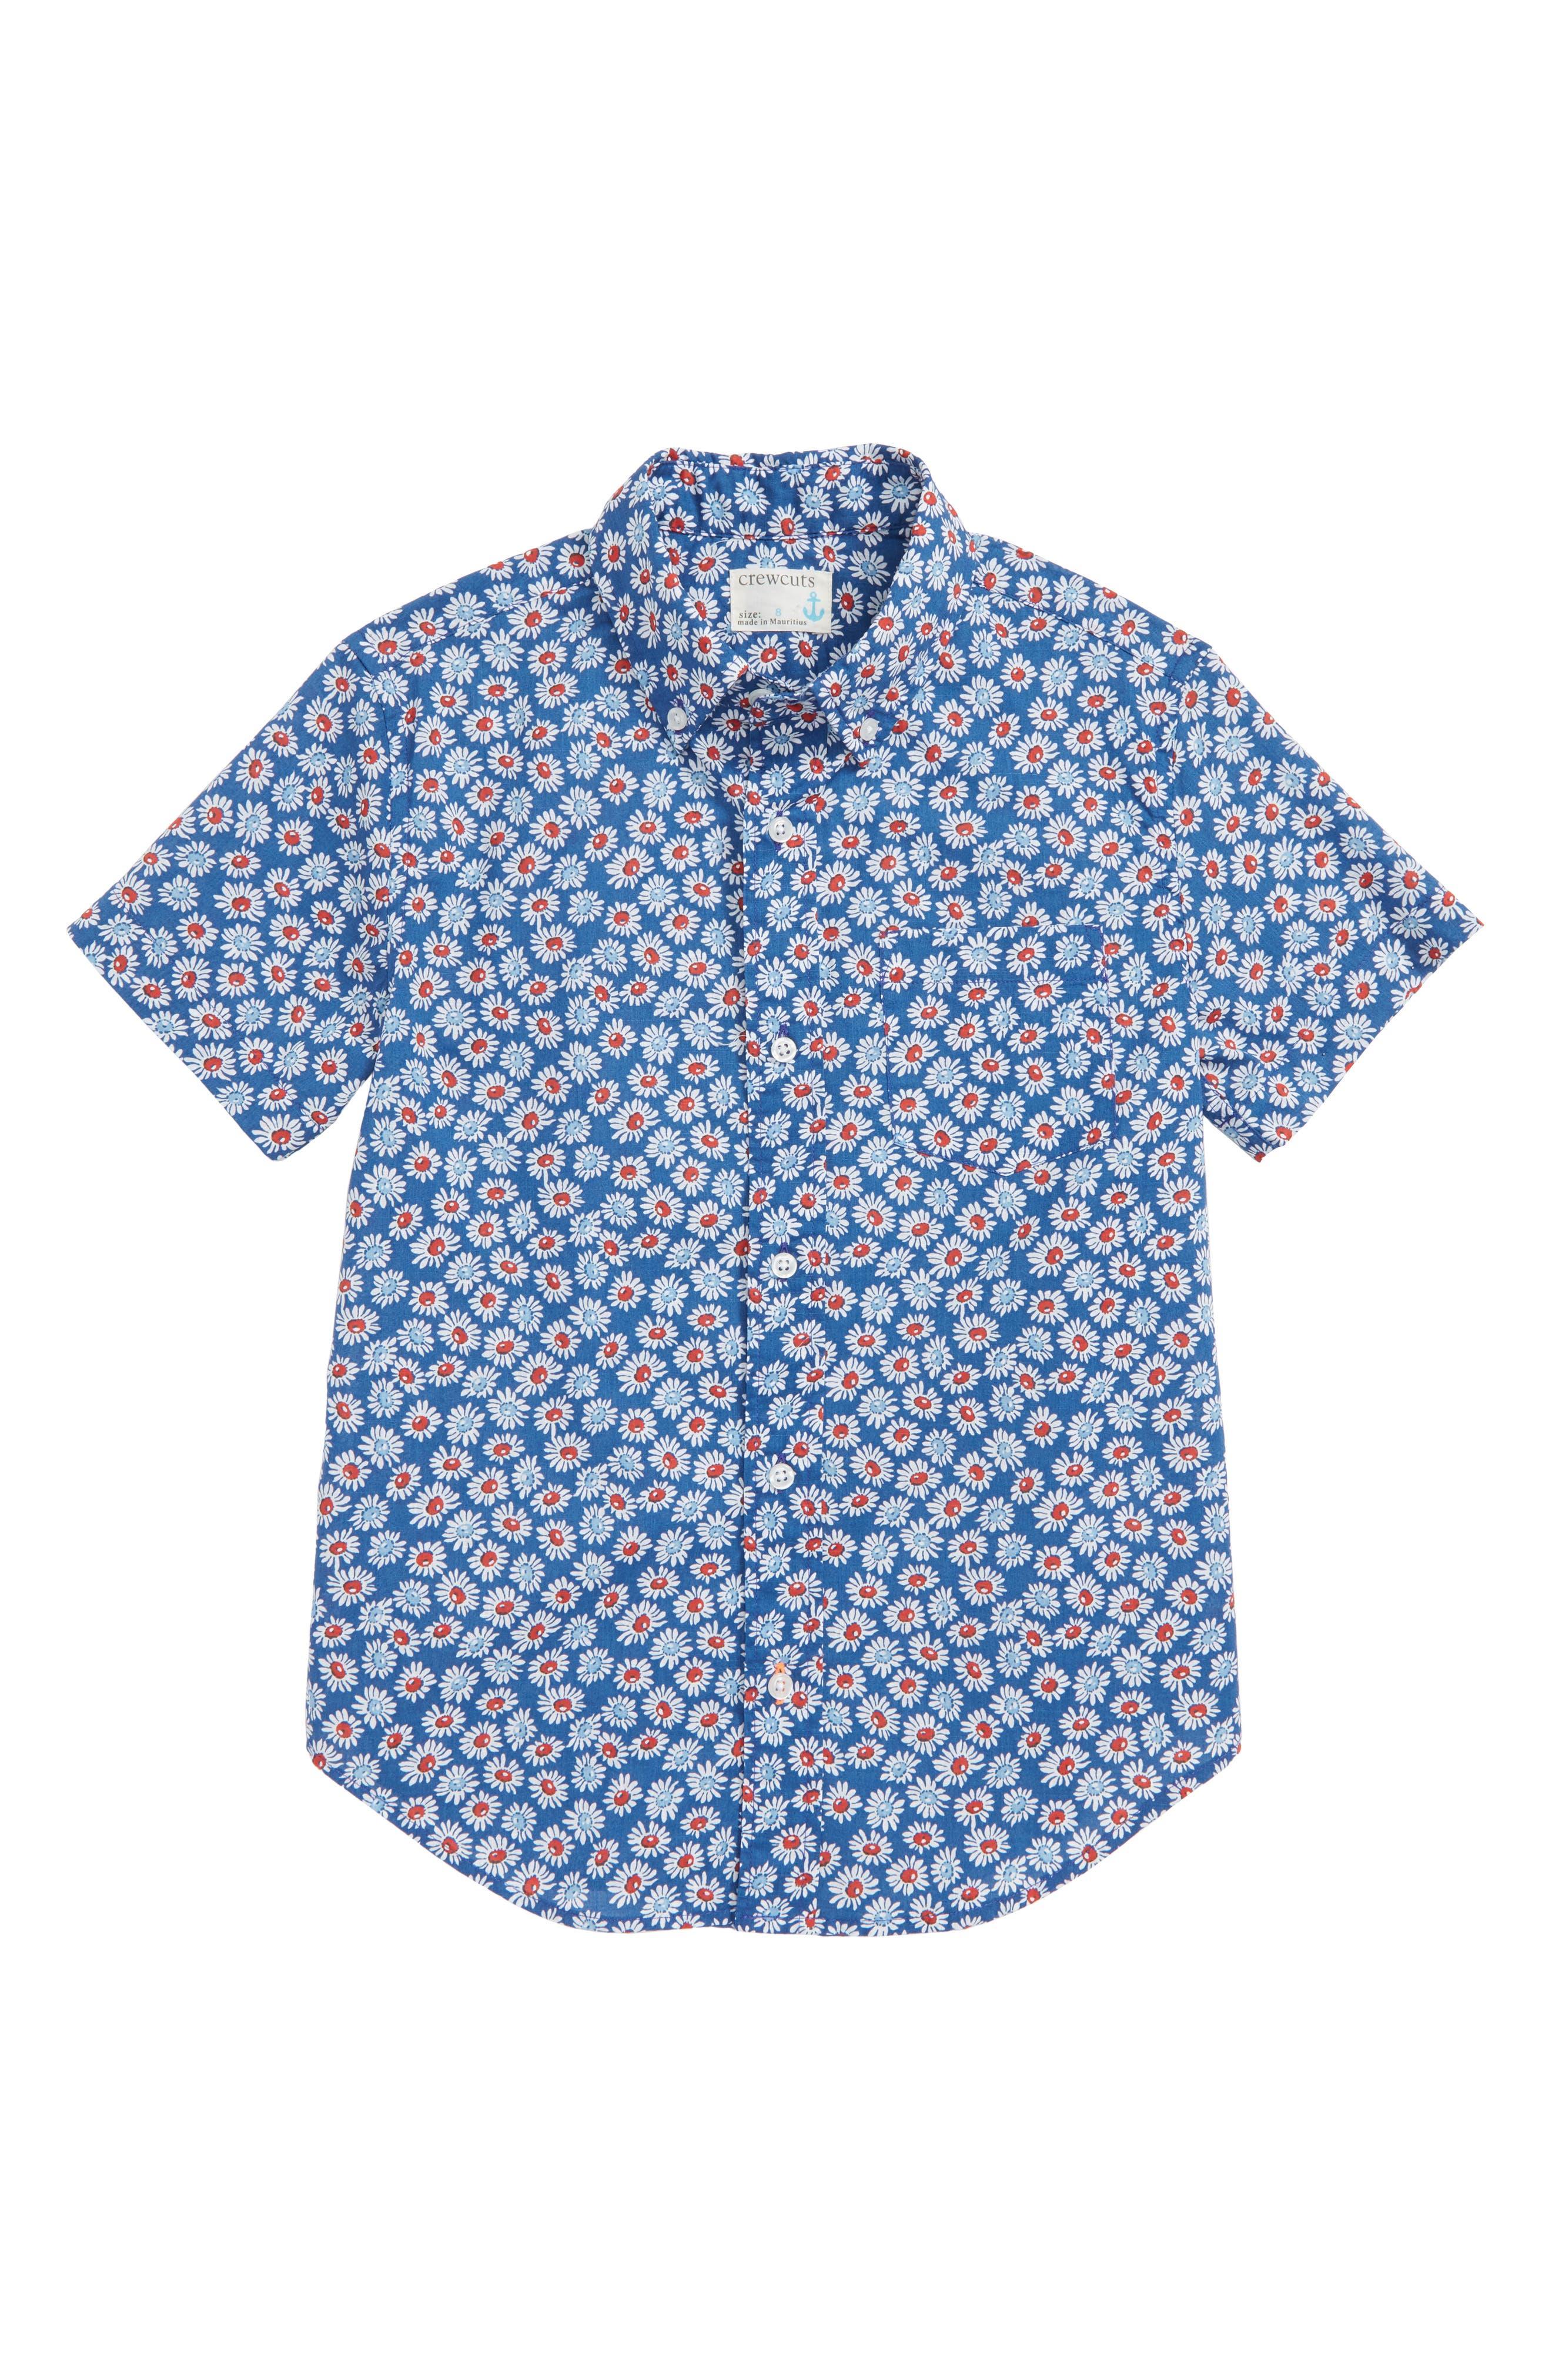 Secret Wash Daisy Shirt,                             Main thumbnail 1, color,                             400